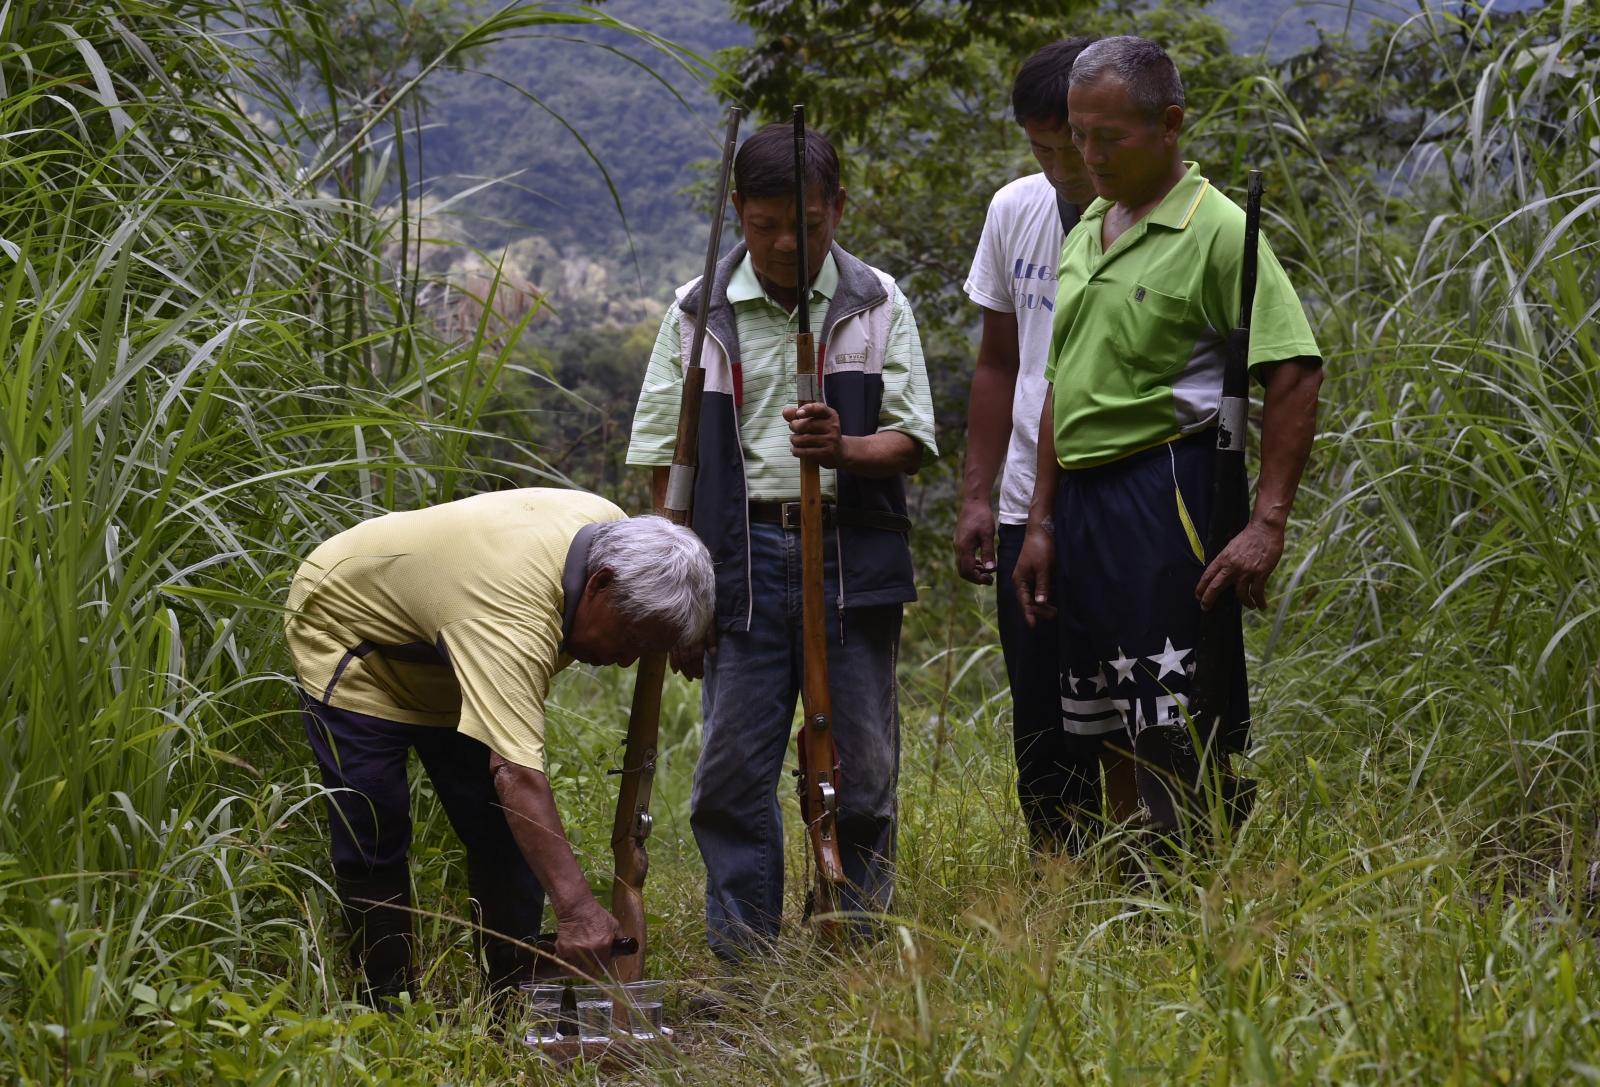 Taiwan indigenous tribe apology